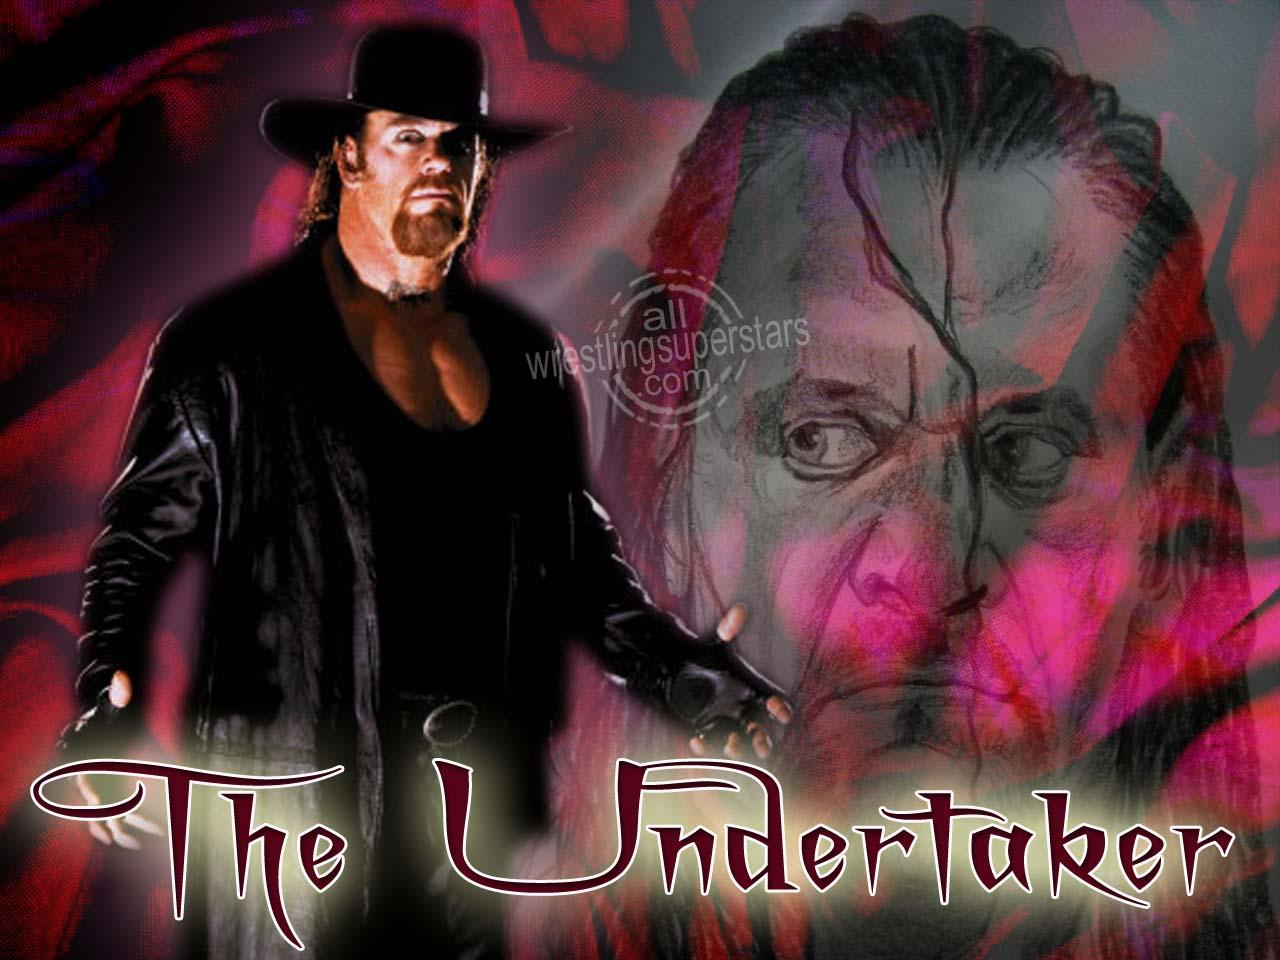 http://2.bp.blogspot.com/-KJ-BPI9EezY/TdpJmbpZhII/AAAAAAAAChw/GPRi-yQhB5k/s1600/wwe-wallpapers-undertaker-8.jpg